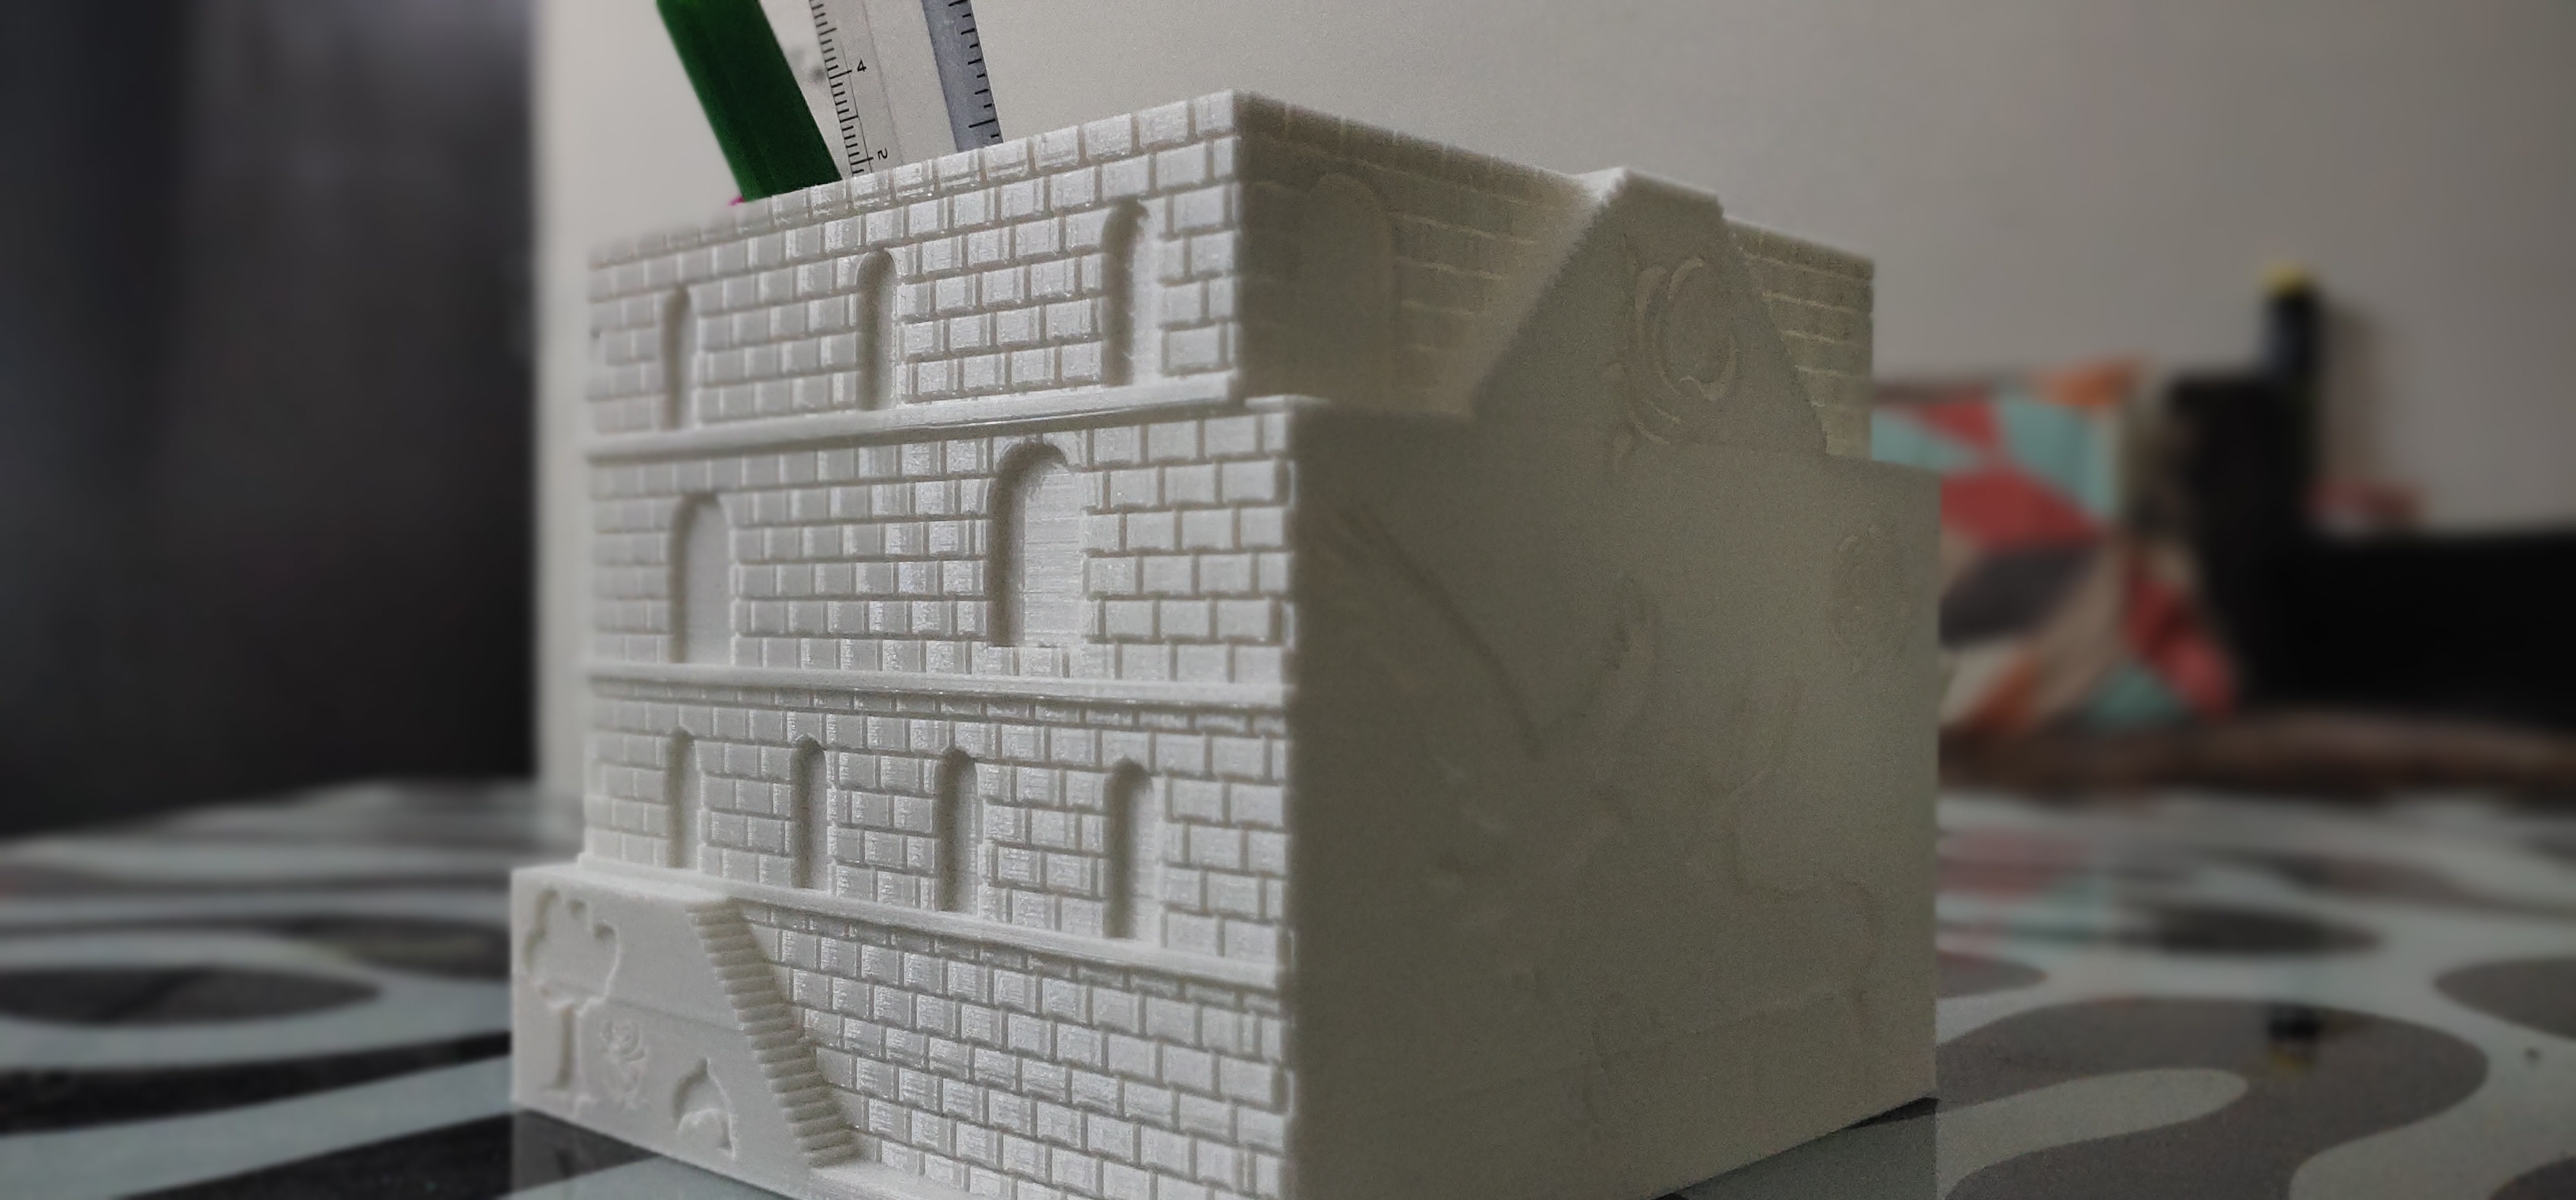 IMG_20200928_155921.jpg Download STL file Plant and desk pot • 3D printer object, FutureDesigns